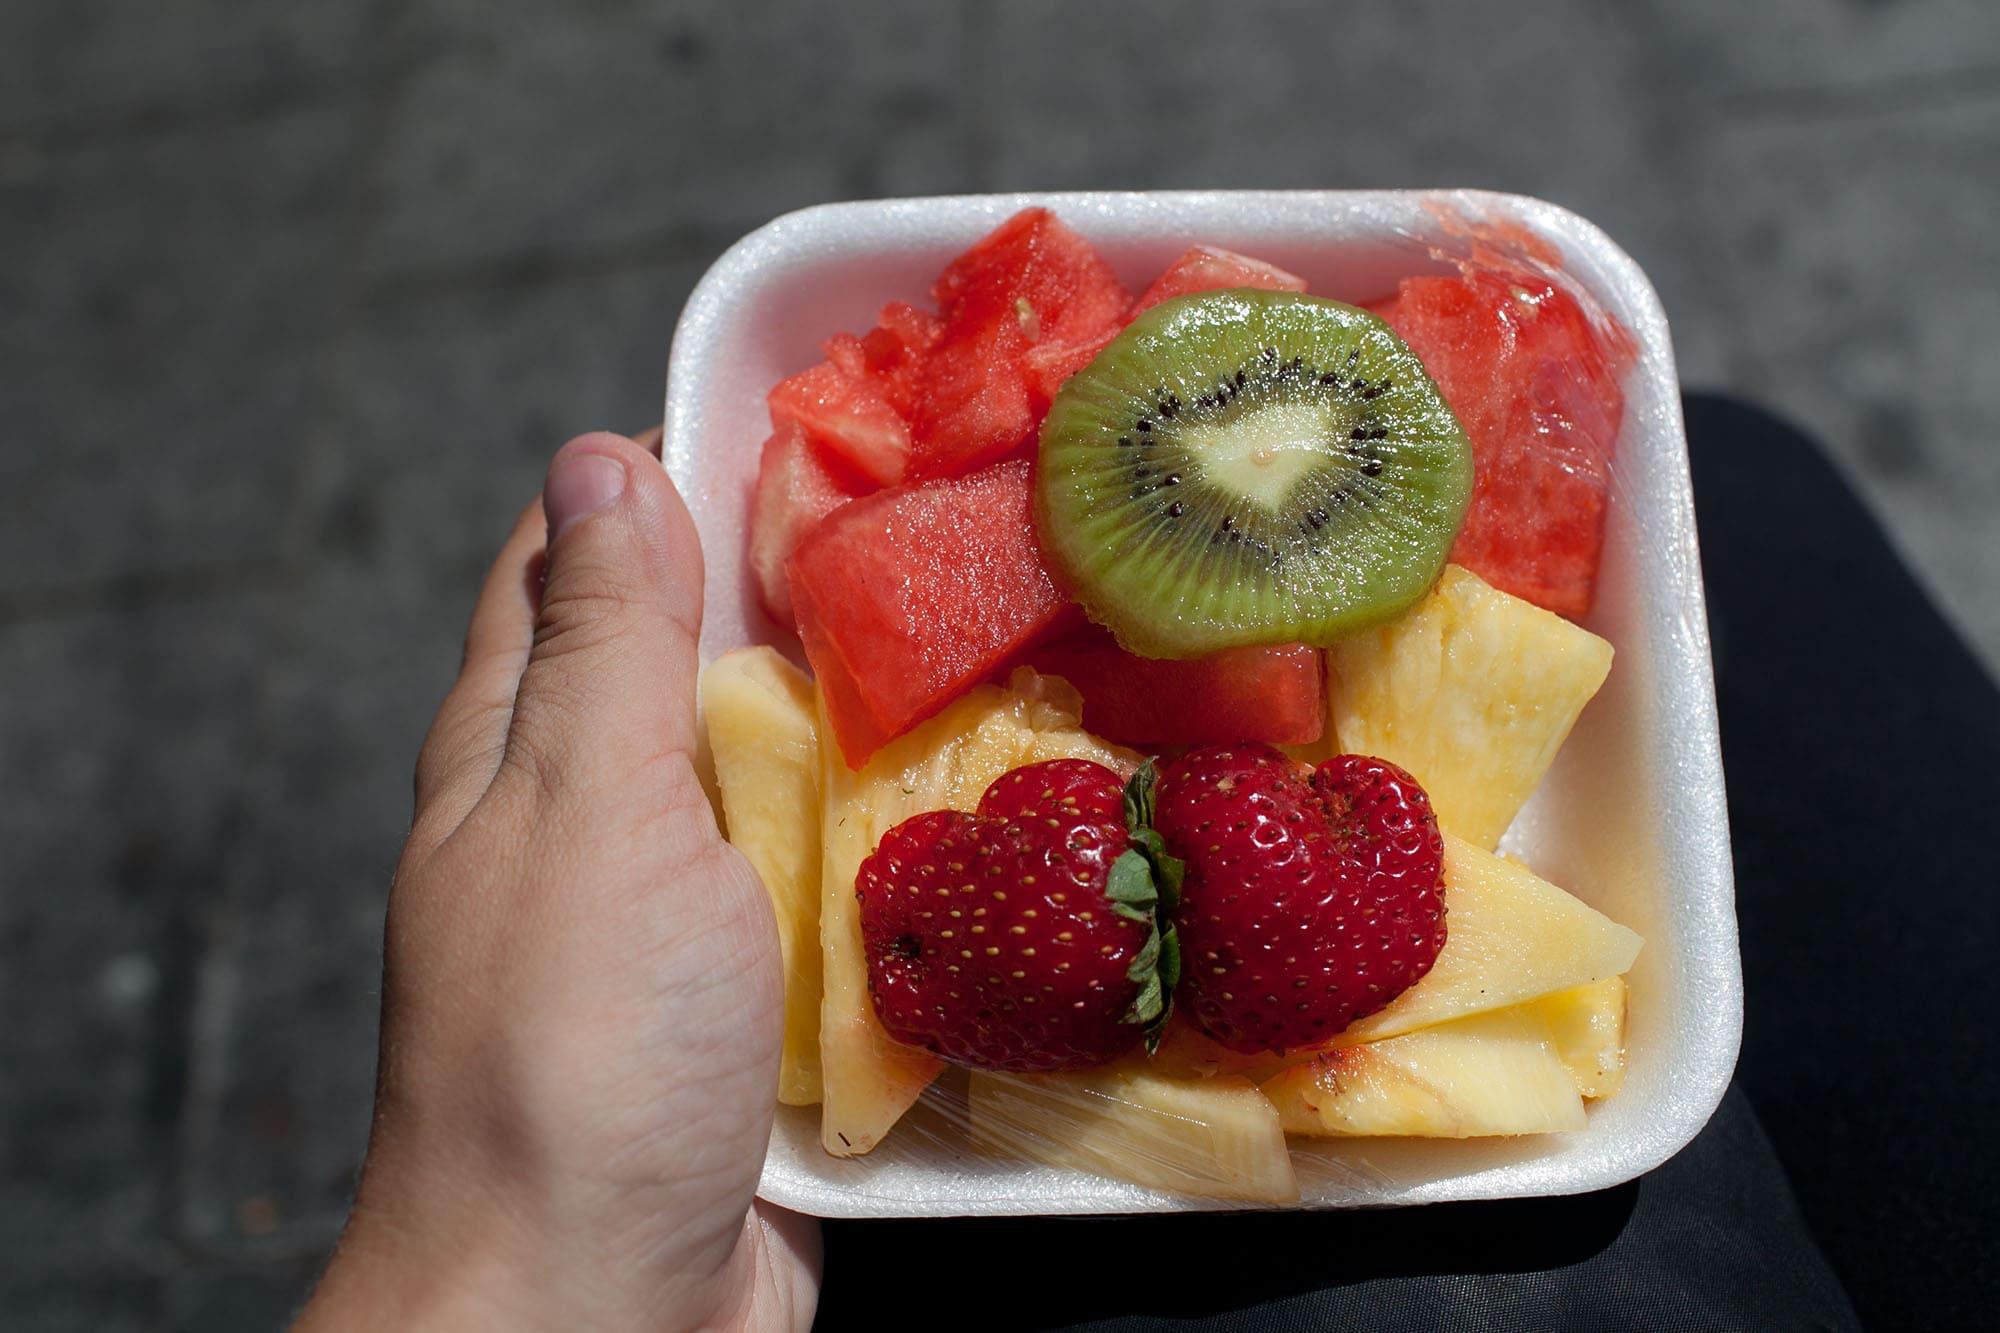 Fruit salad from Mercat de Santa Caterina in Barcelona, Spain.